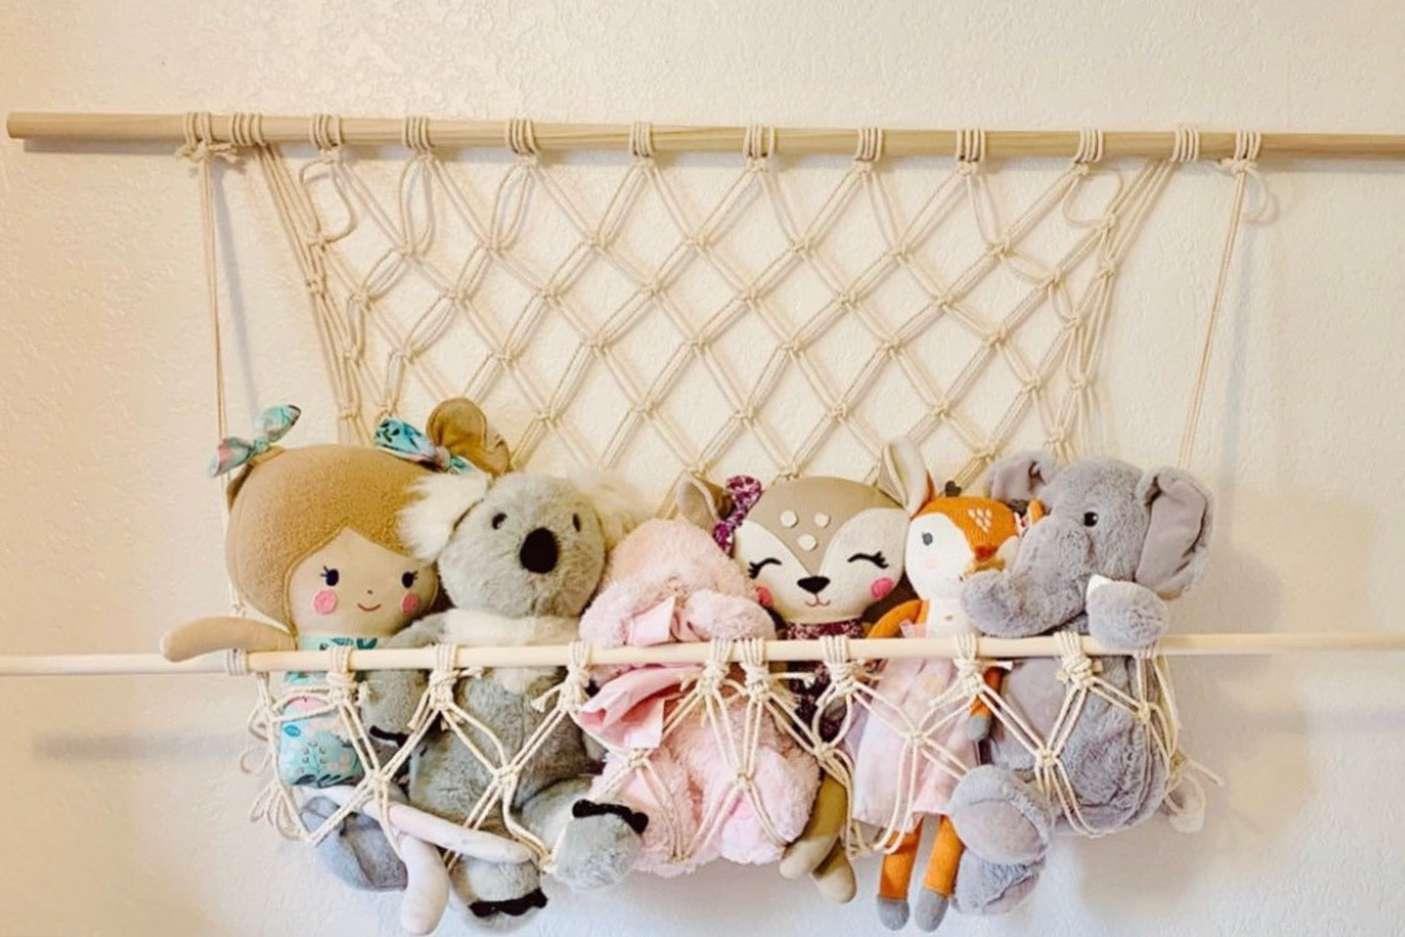 Wall hammock with stuffed animals